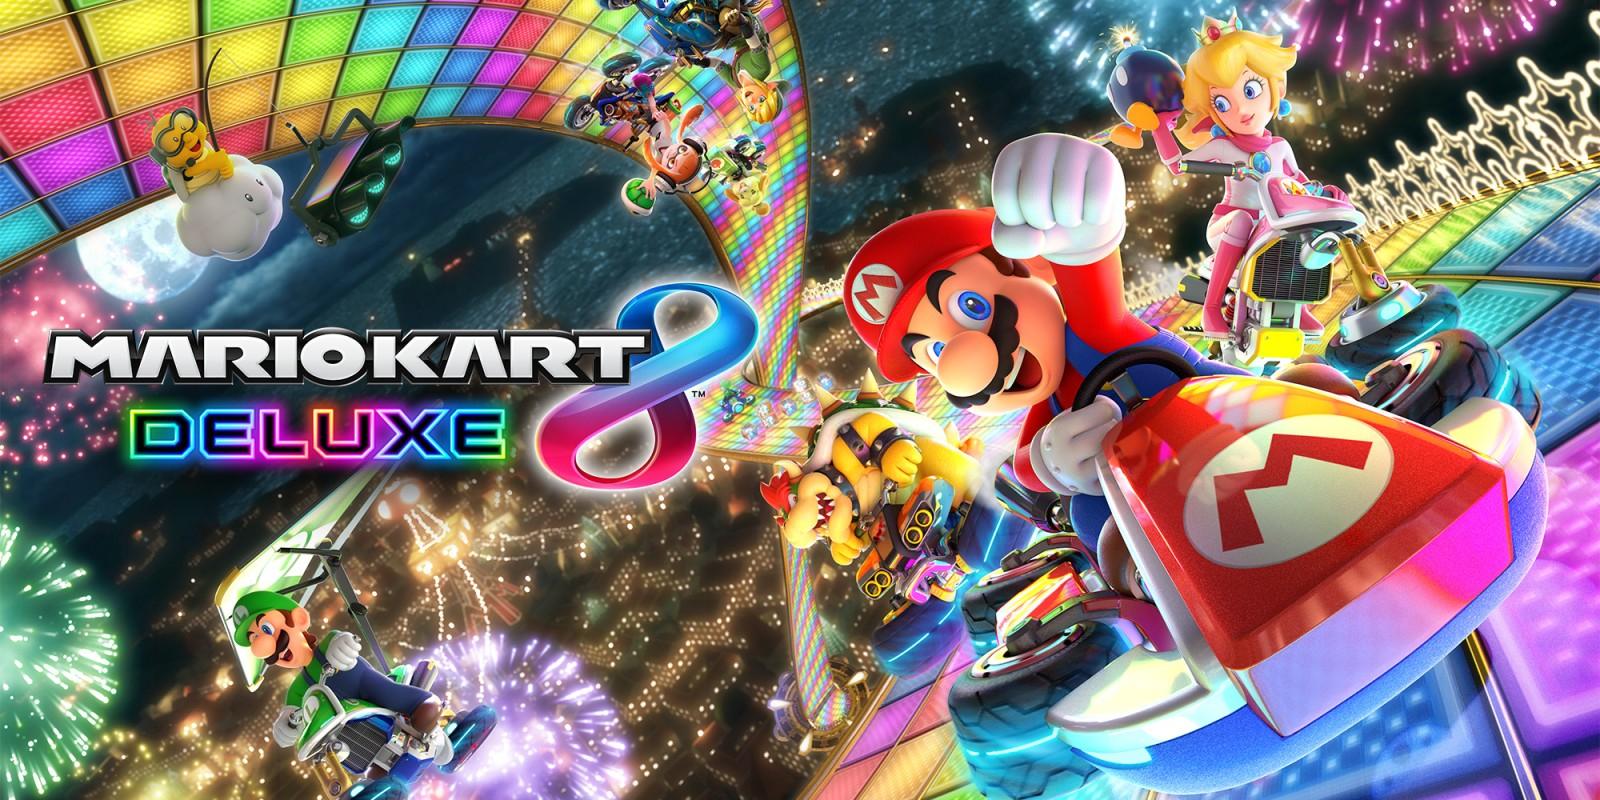 Mario Kart 8 Deluxe (Nintendo Switch) £33.29 @ Nintendo eShop